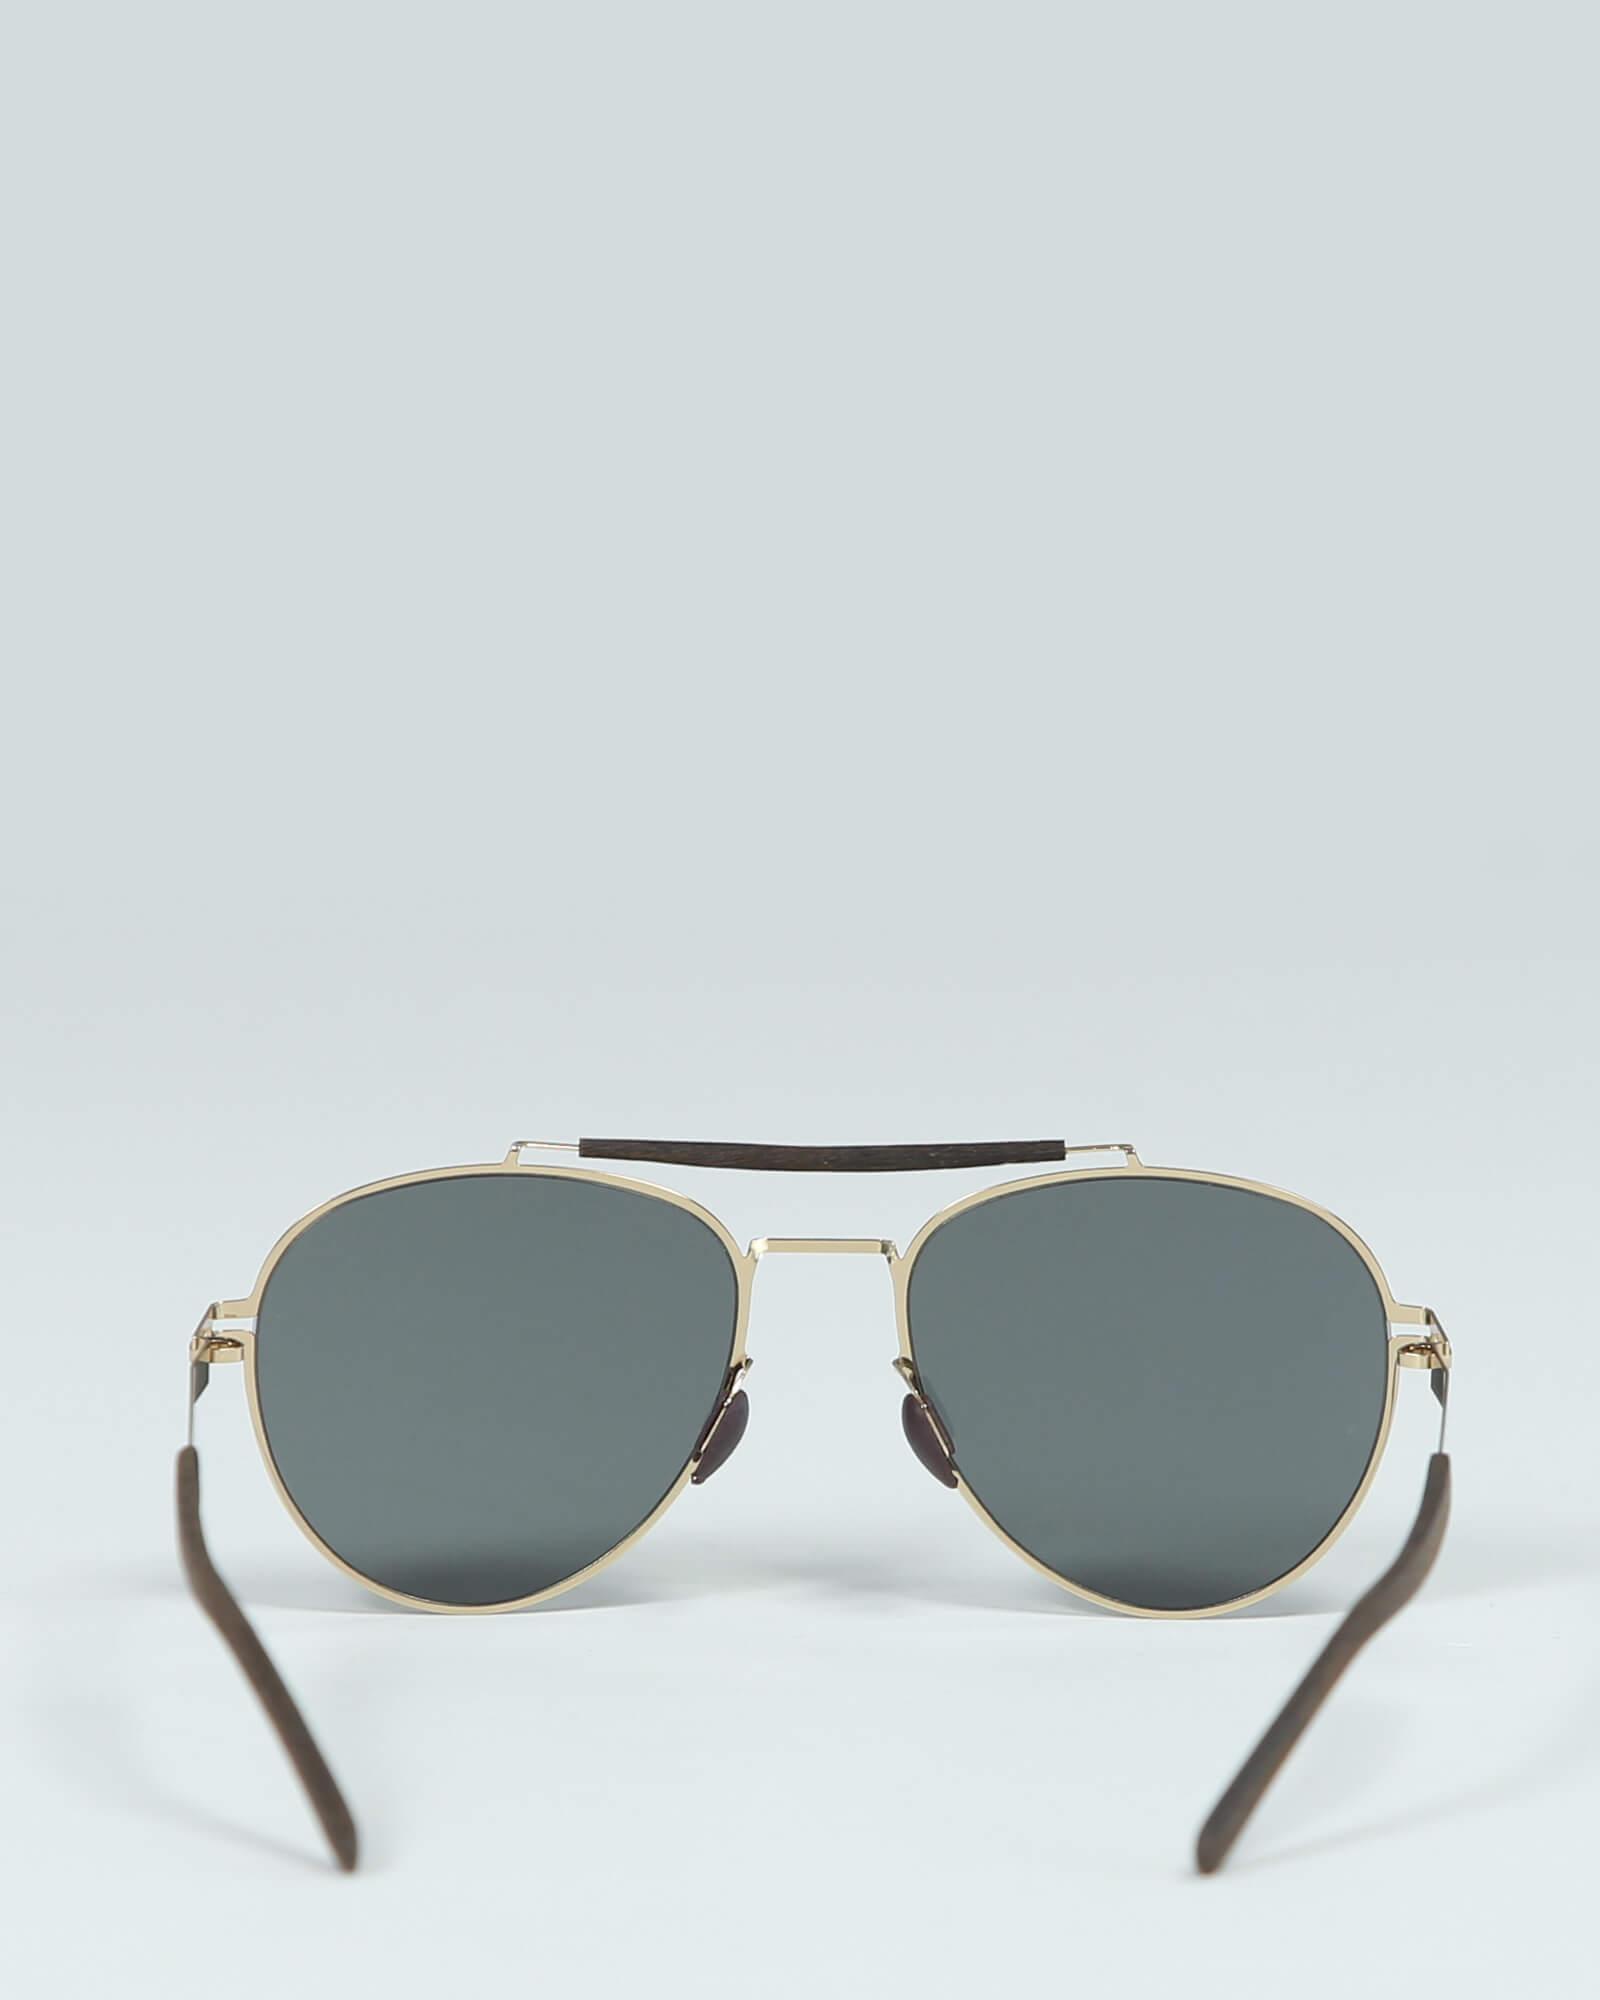 sunglass-4